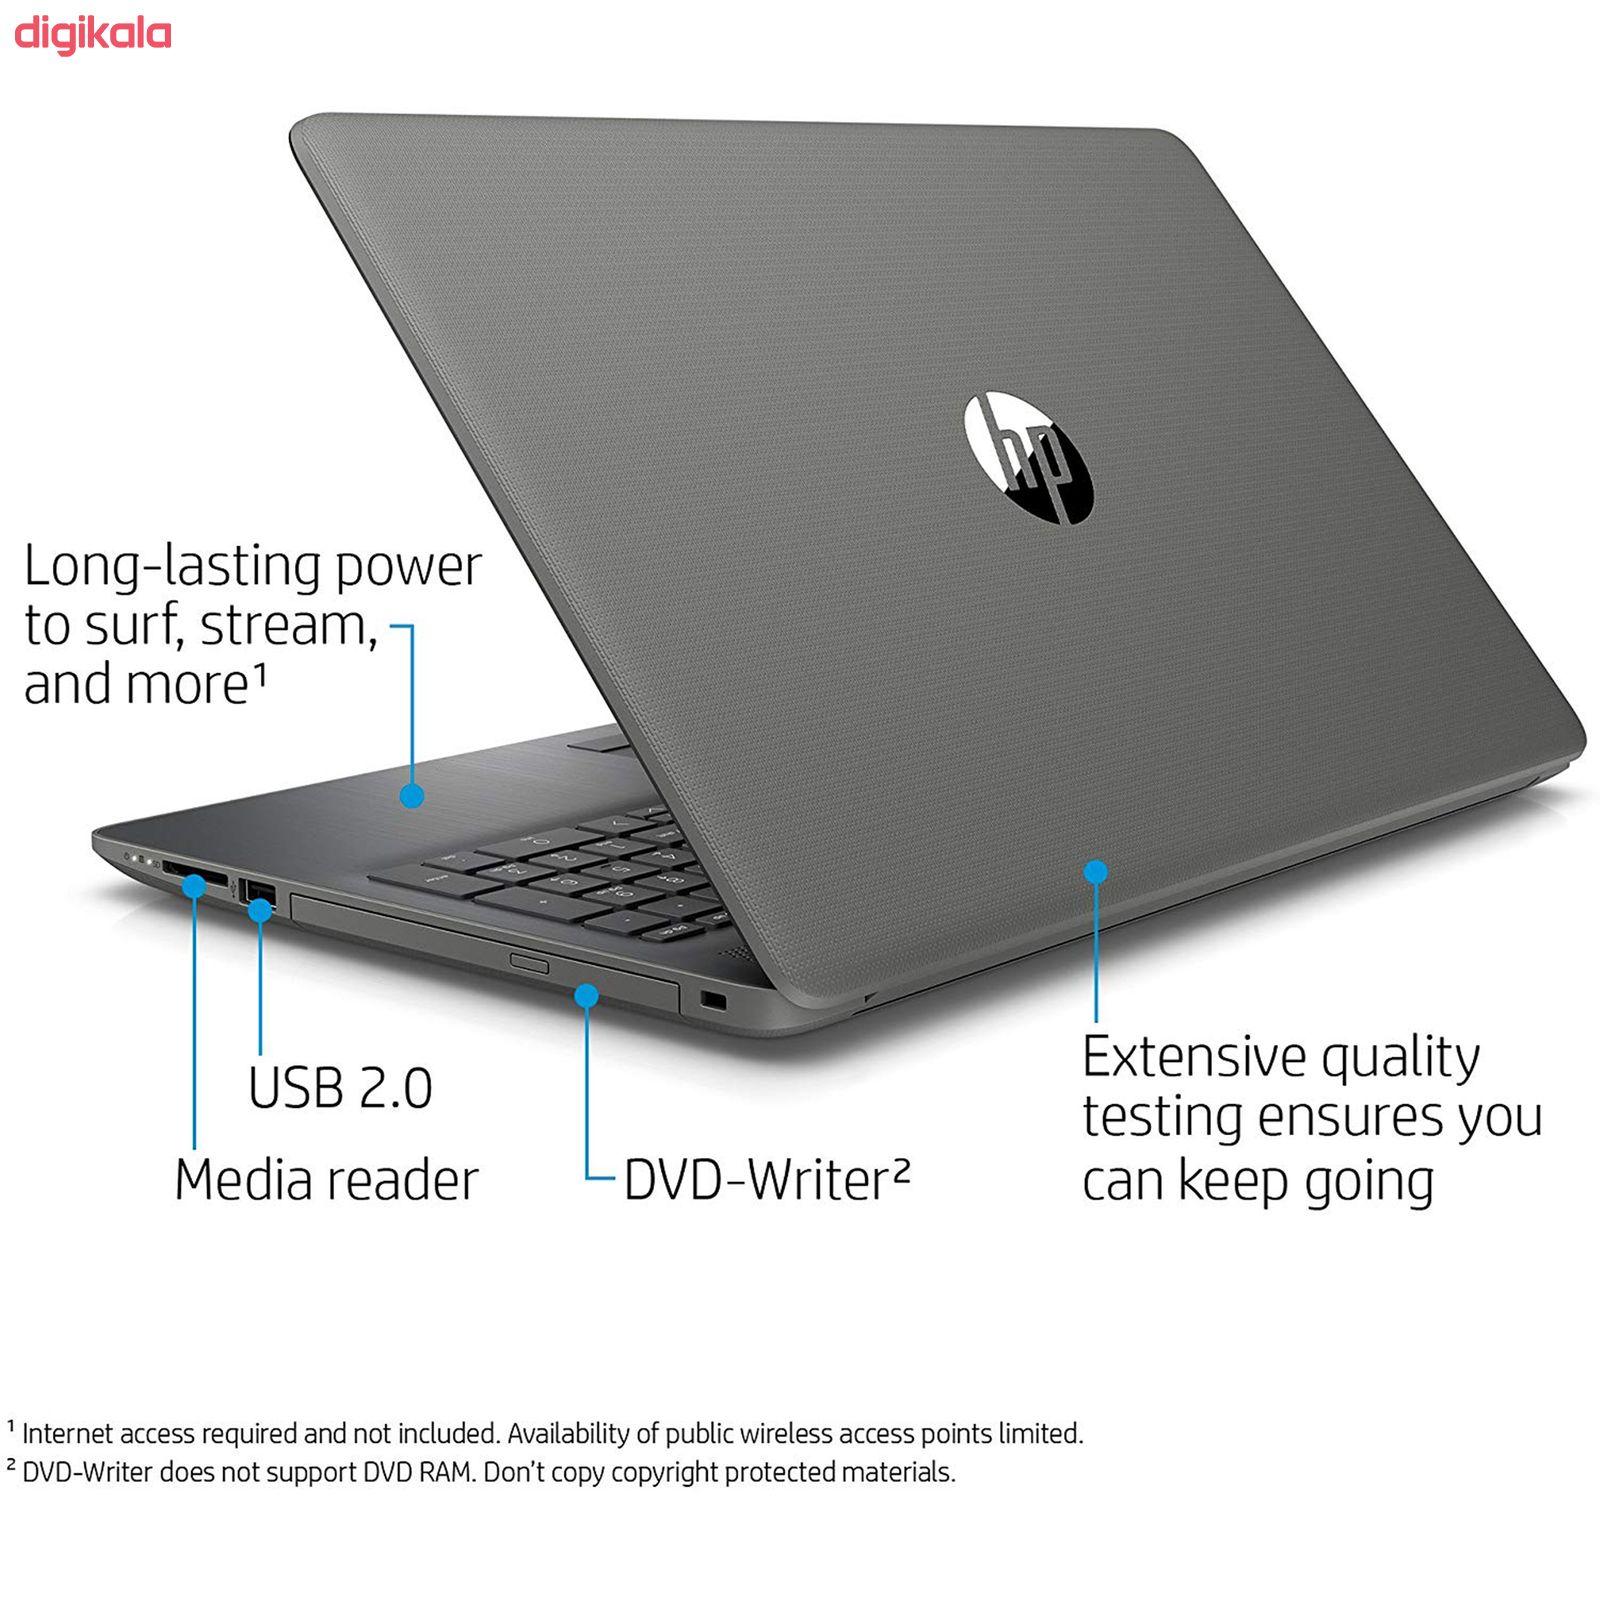 لپ تاپ 15 اینچی اچ پی مدل 255 G7-C1